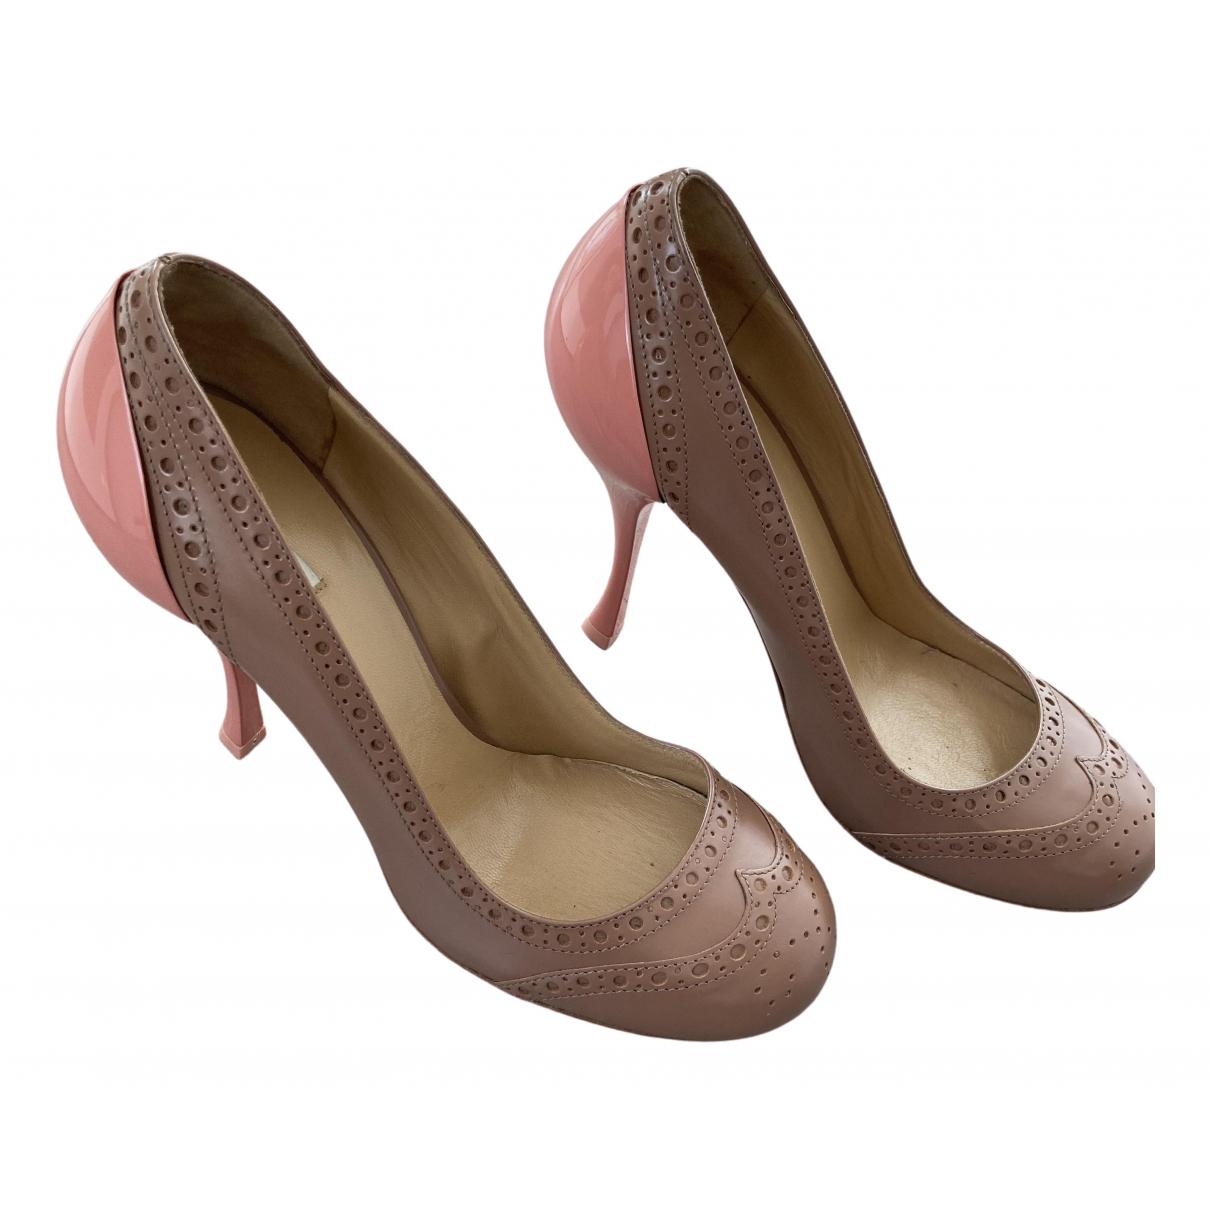 Miu Miu N Brown Leather Heels for Women 36 EU